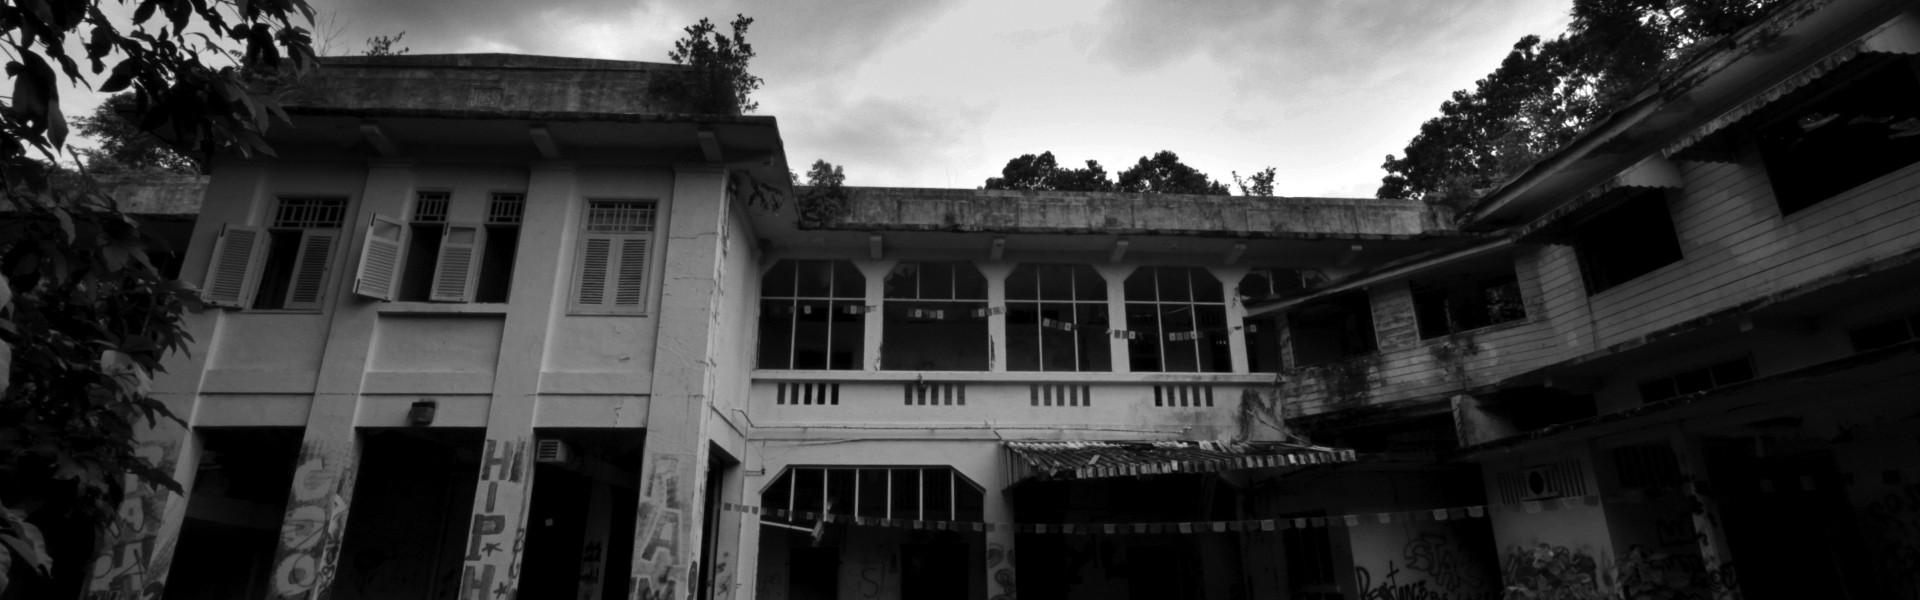 Raj-Kiran-Hotel-Lonavla